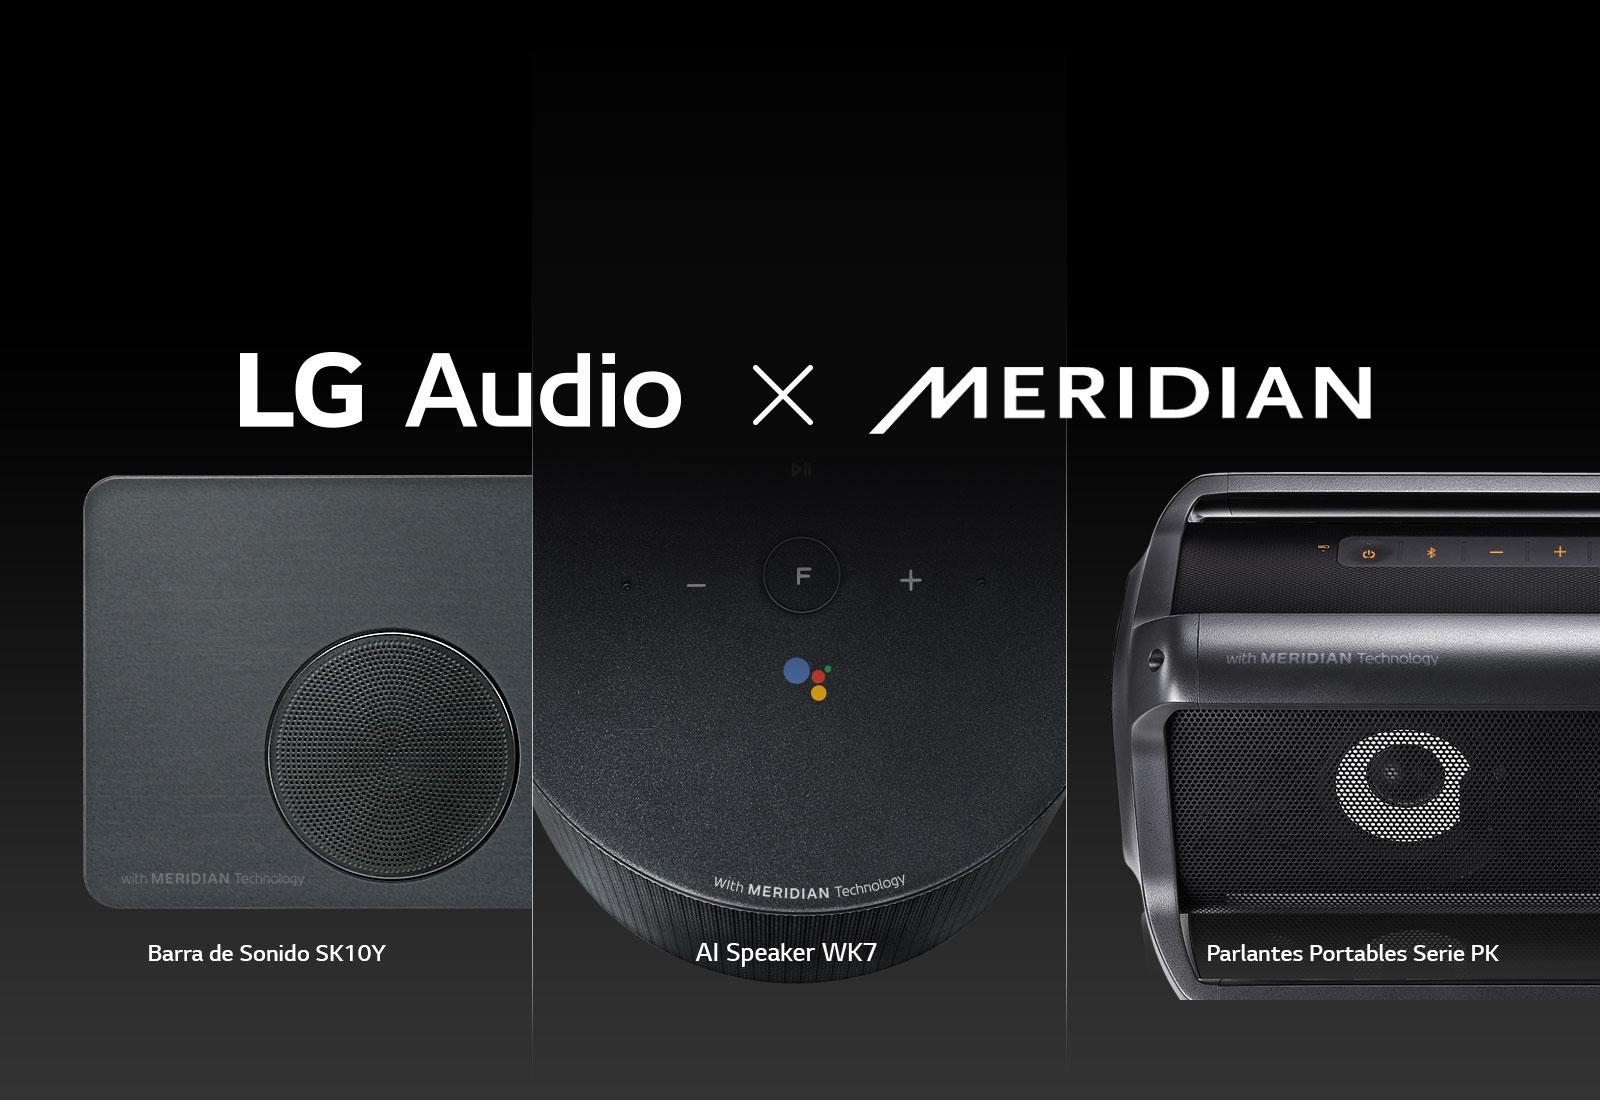 02_PK5_LG_partners_with_Meridian_Audior_Desktop